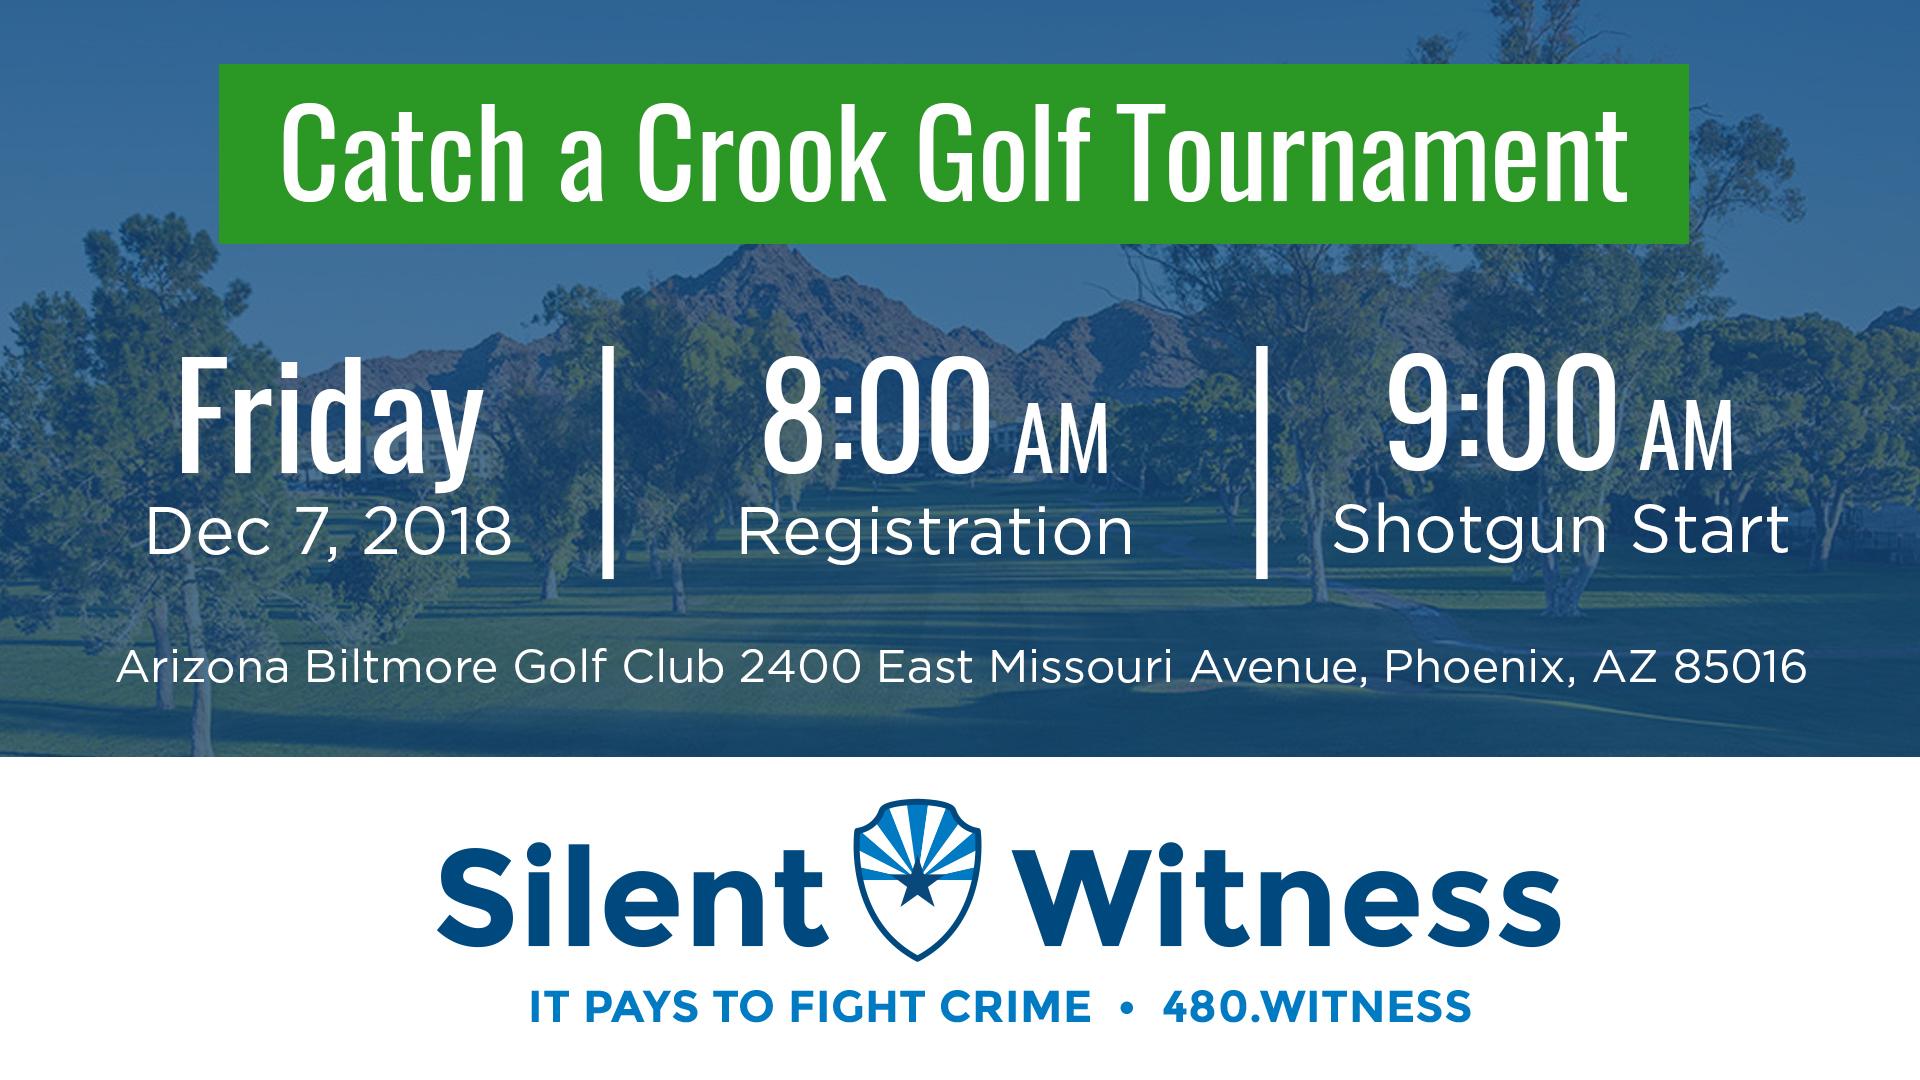 Catch a Crook Golf Tournament Info